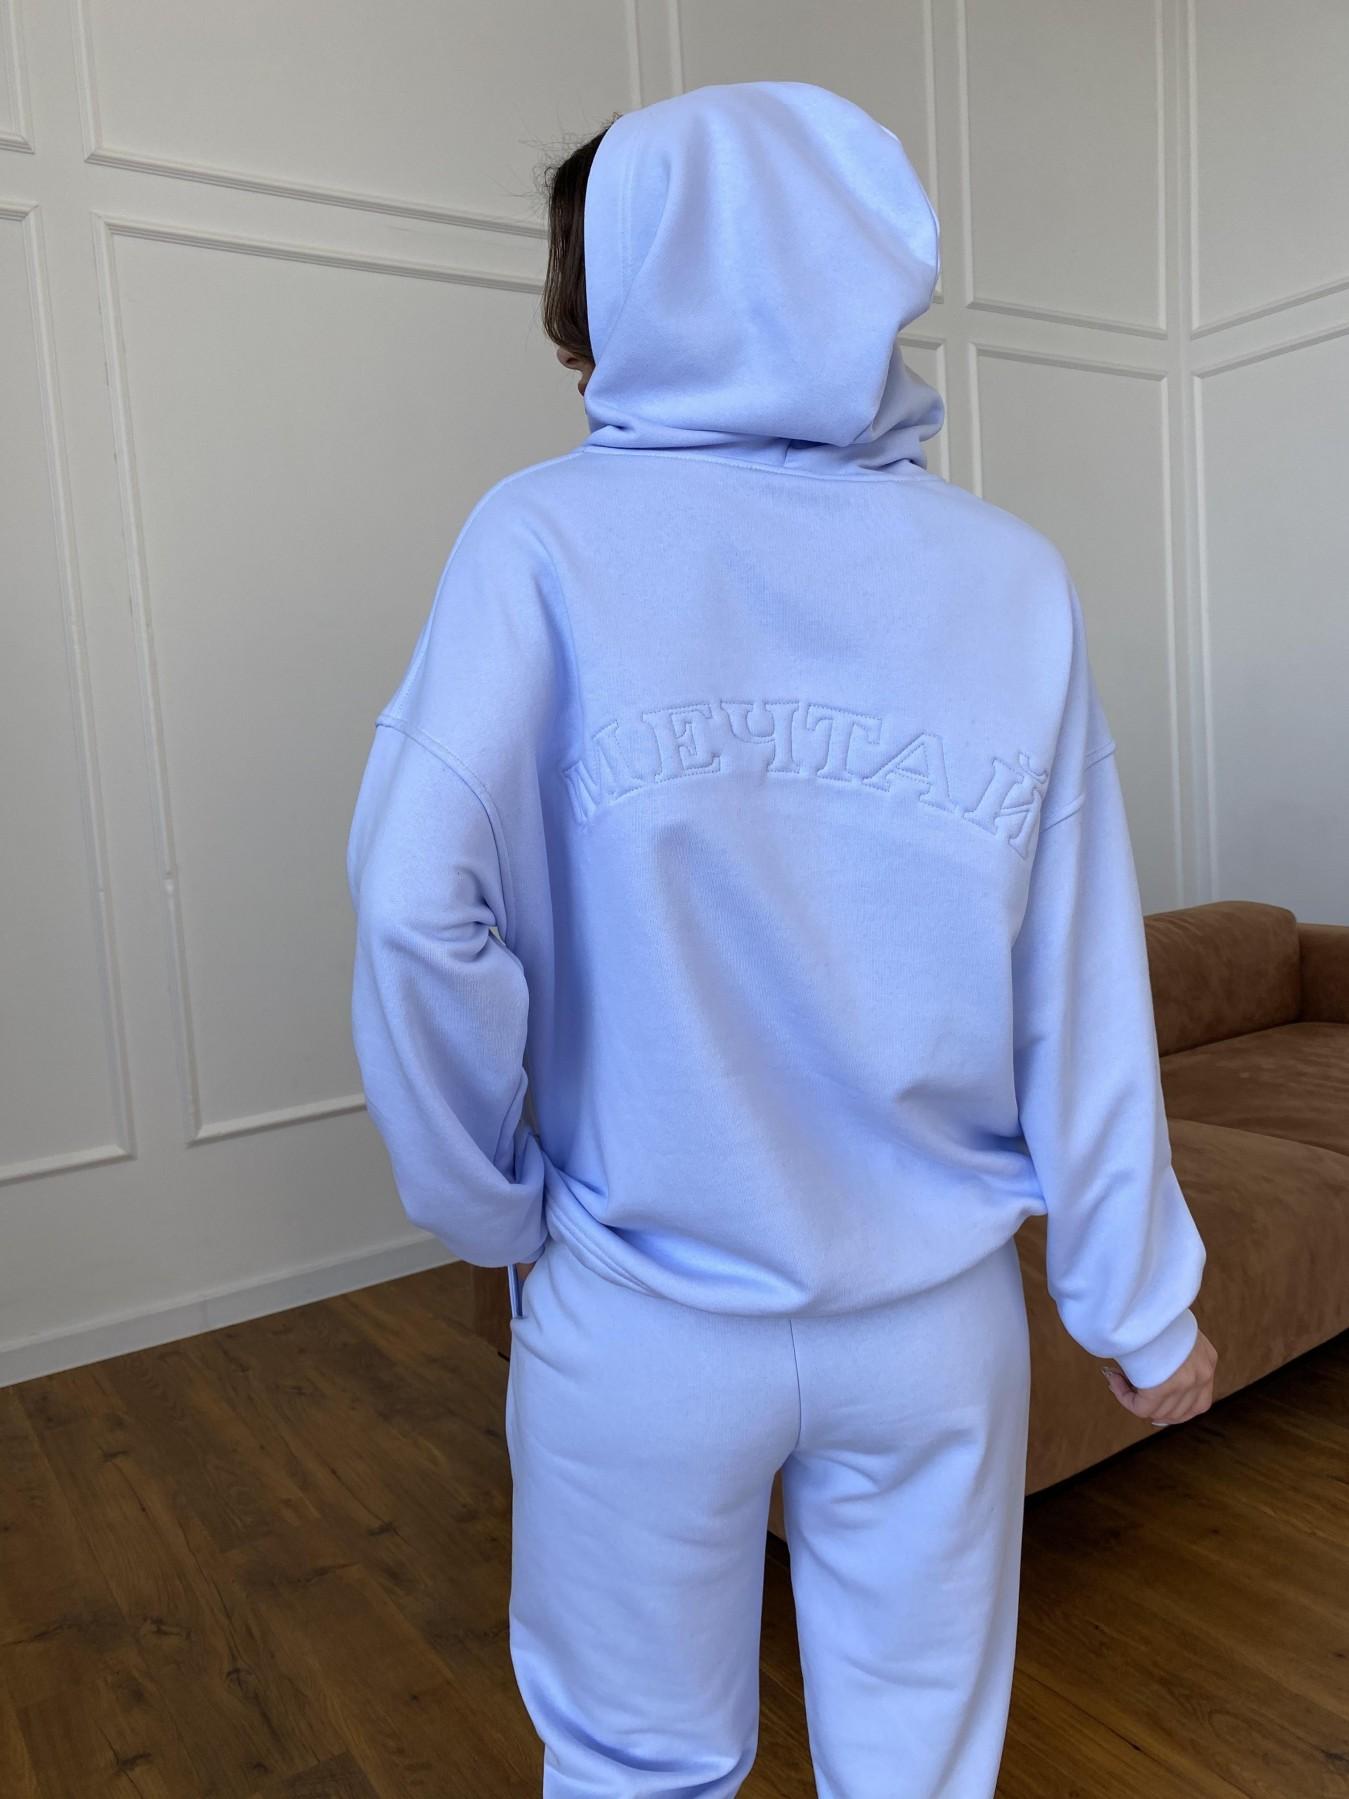 Мечтай костюм  трикотаж 3х нитка 11242 АРТ. 47757 Цвет: Голубой Светлый - фото 8, интернет магазин tm-modus.ru